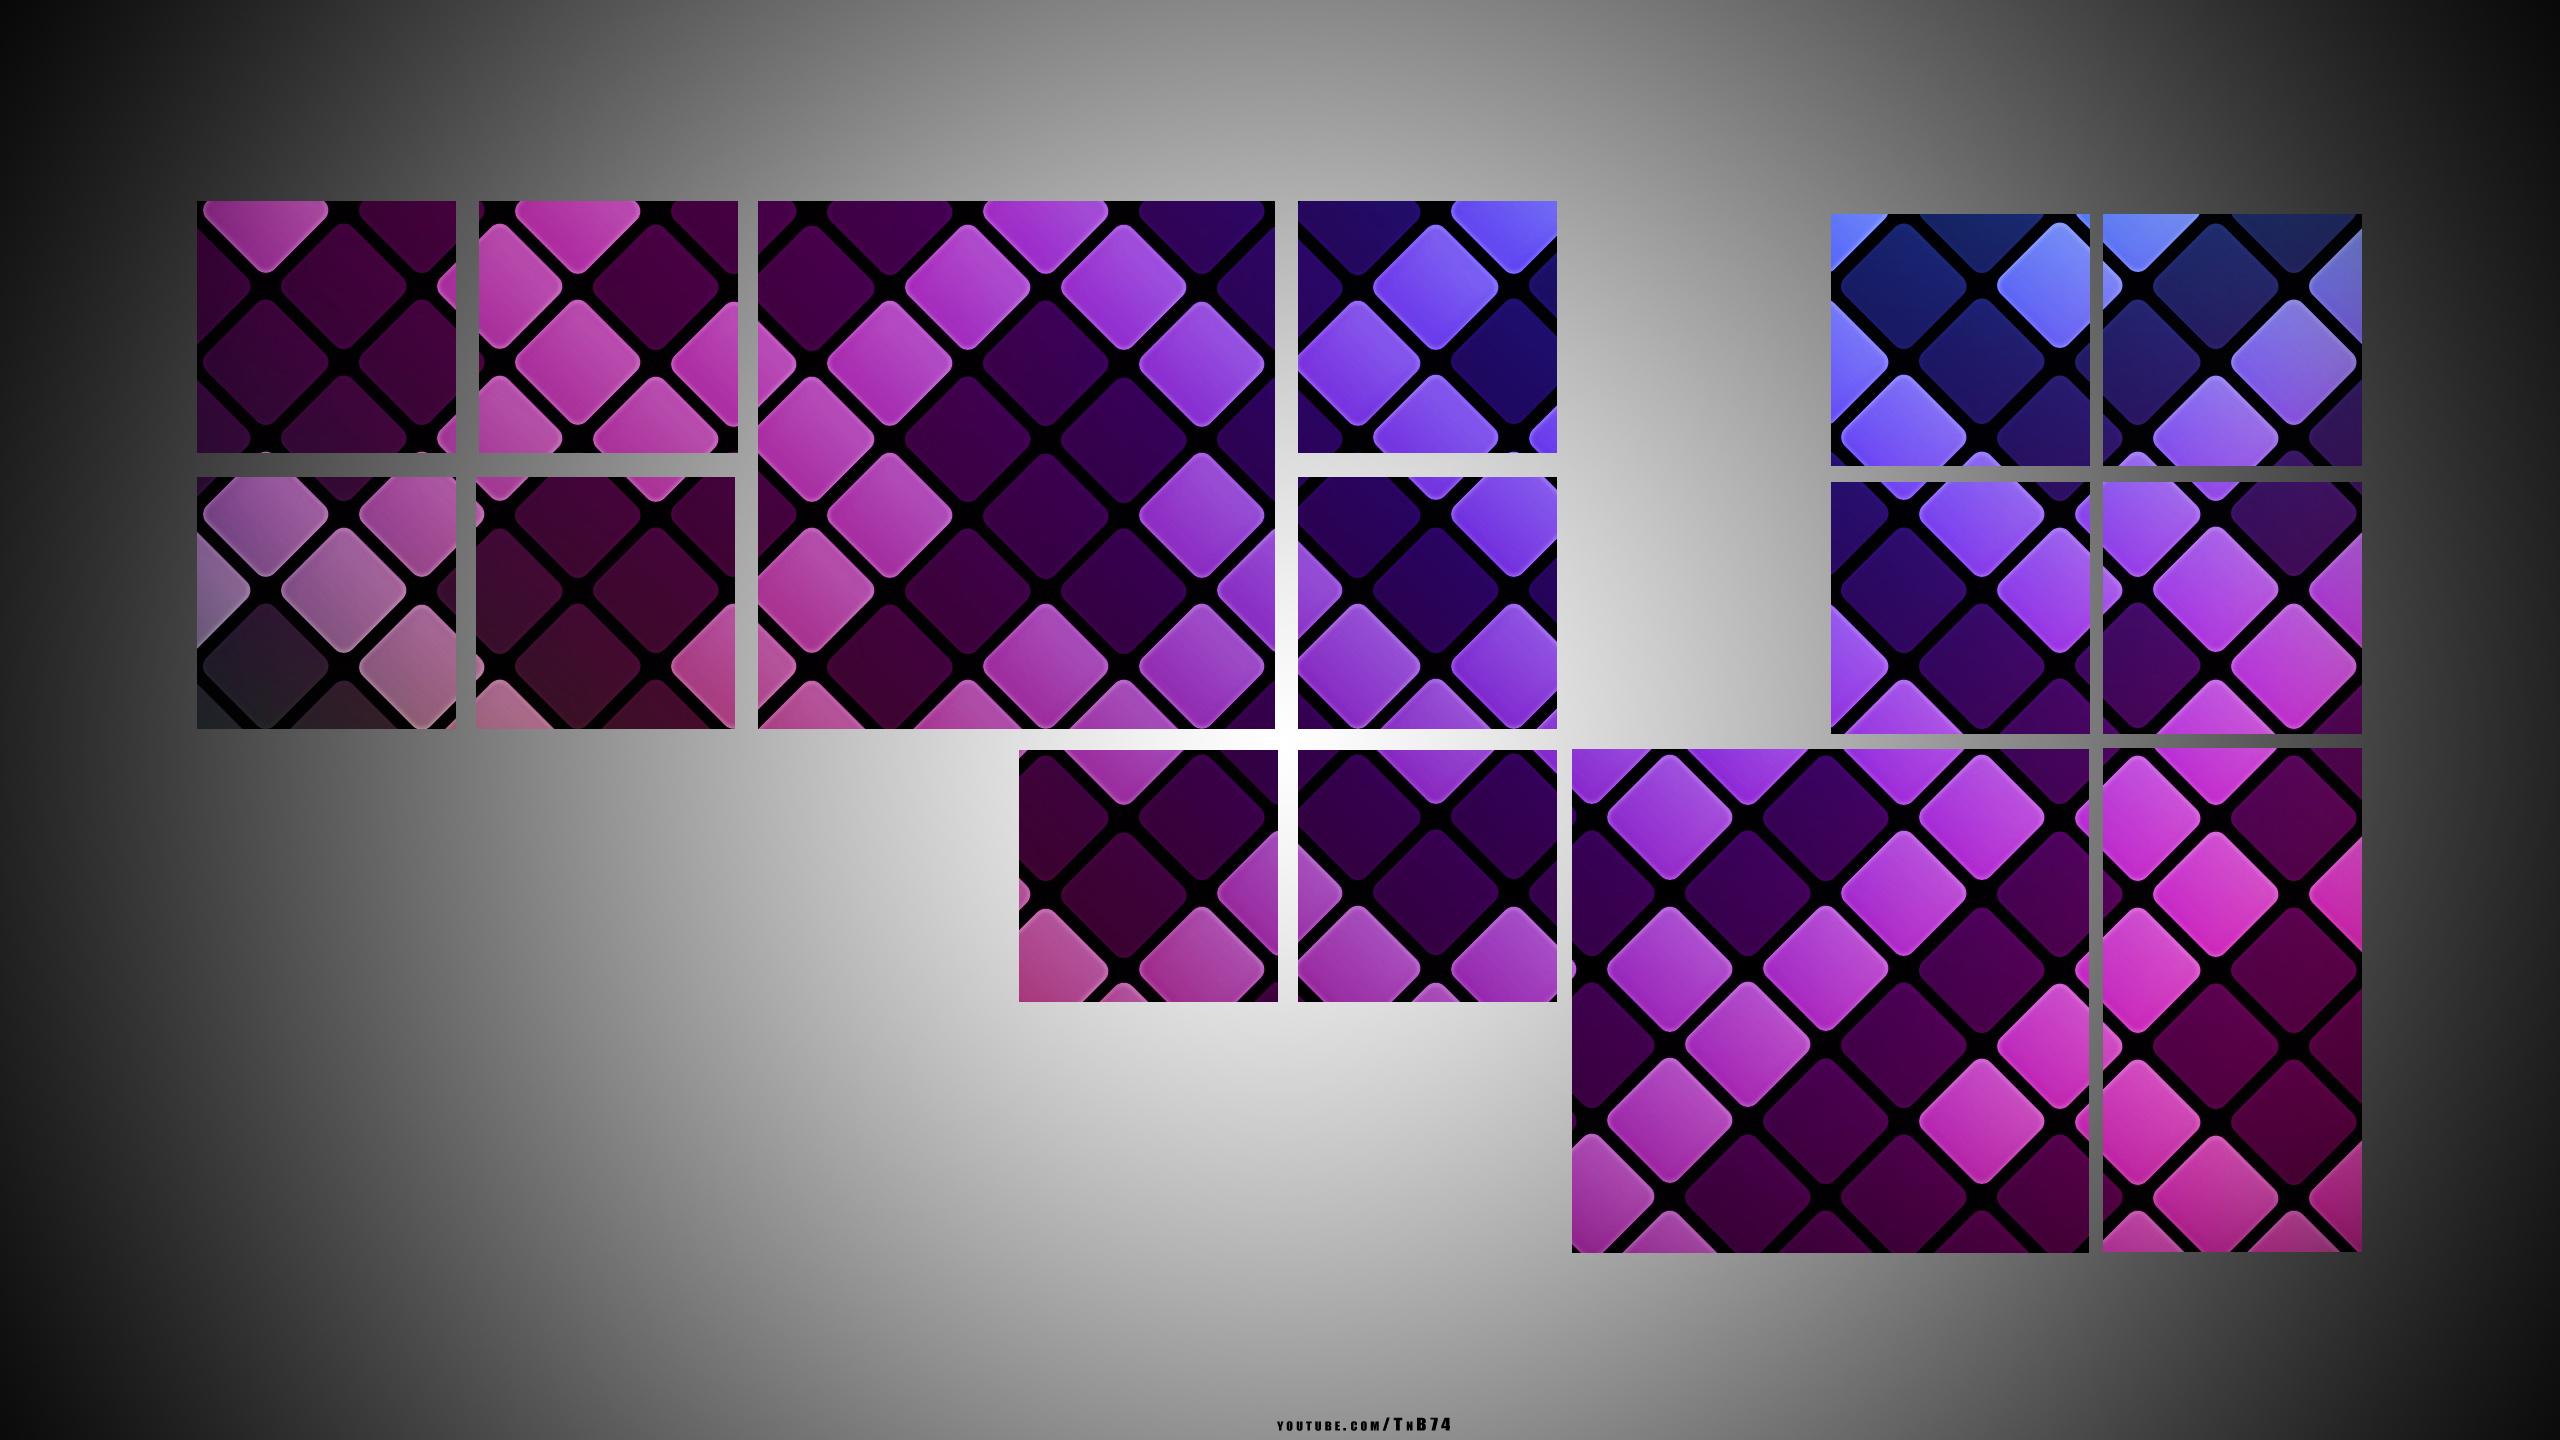 Square Pattern wallpaper [2560x1440] - Free HD Wallpapers